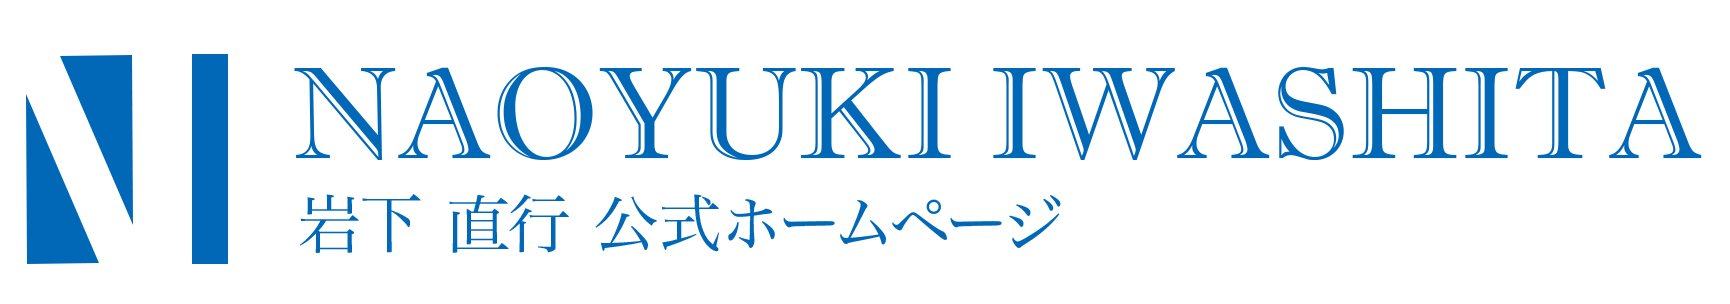 Naoyuki Iwashita official website